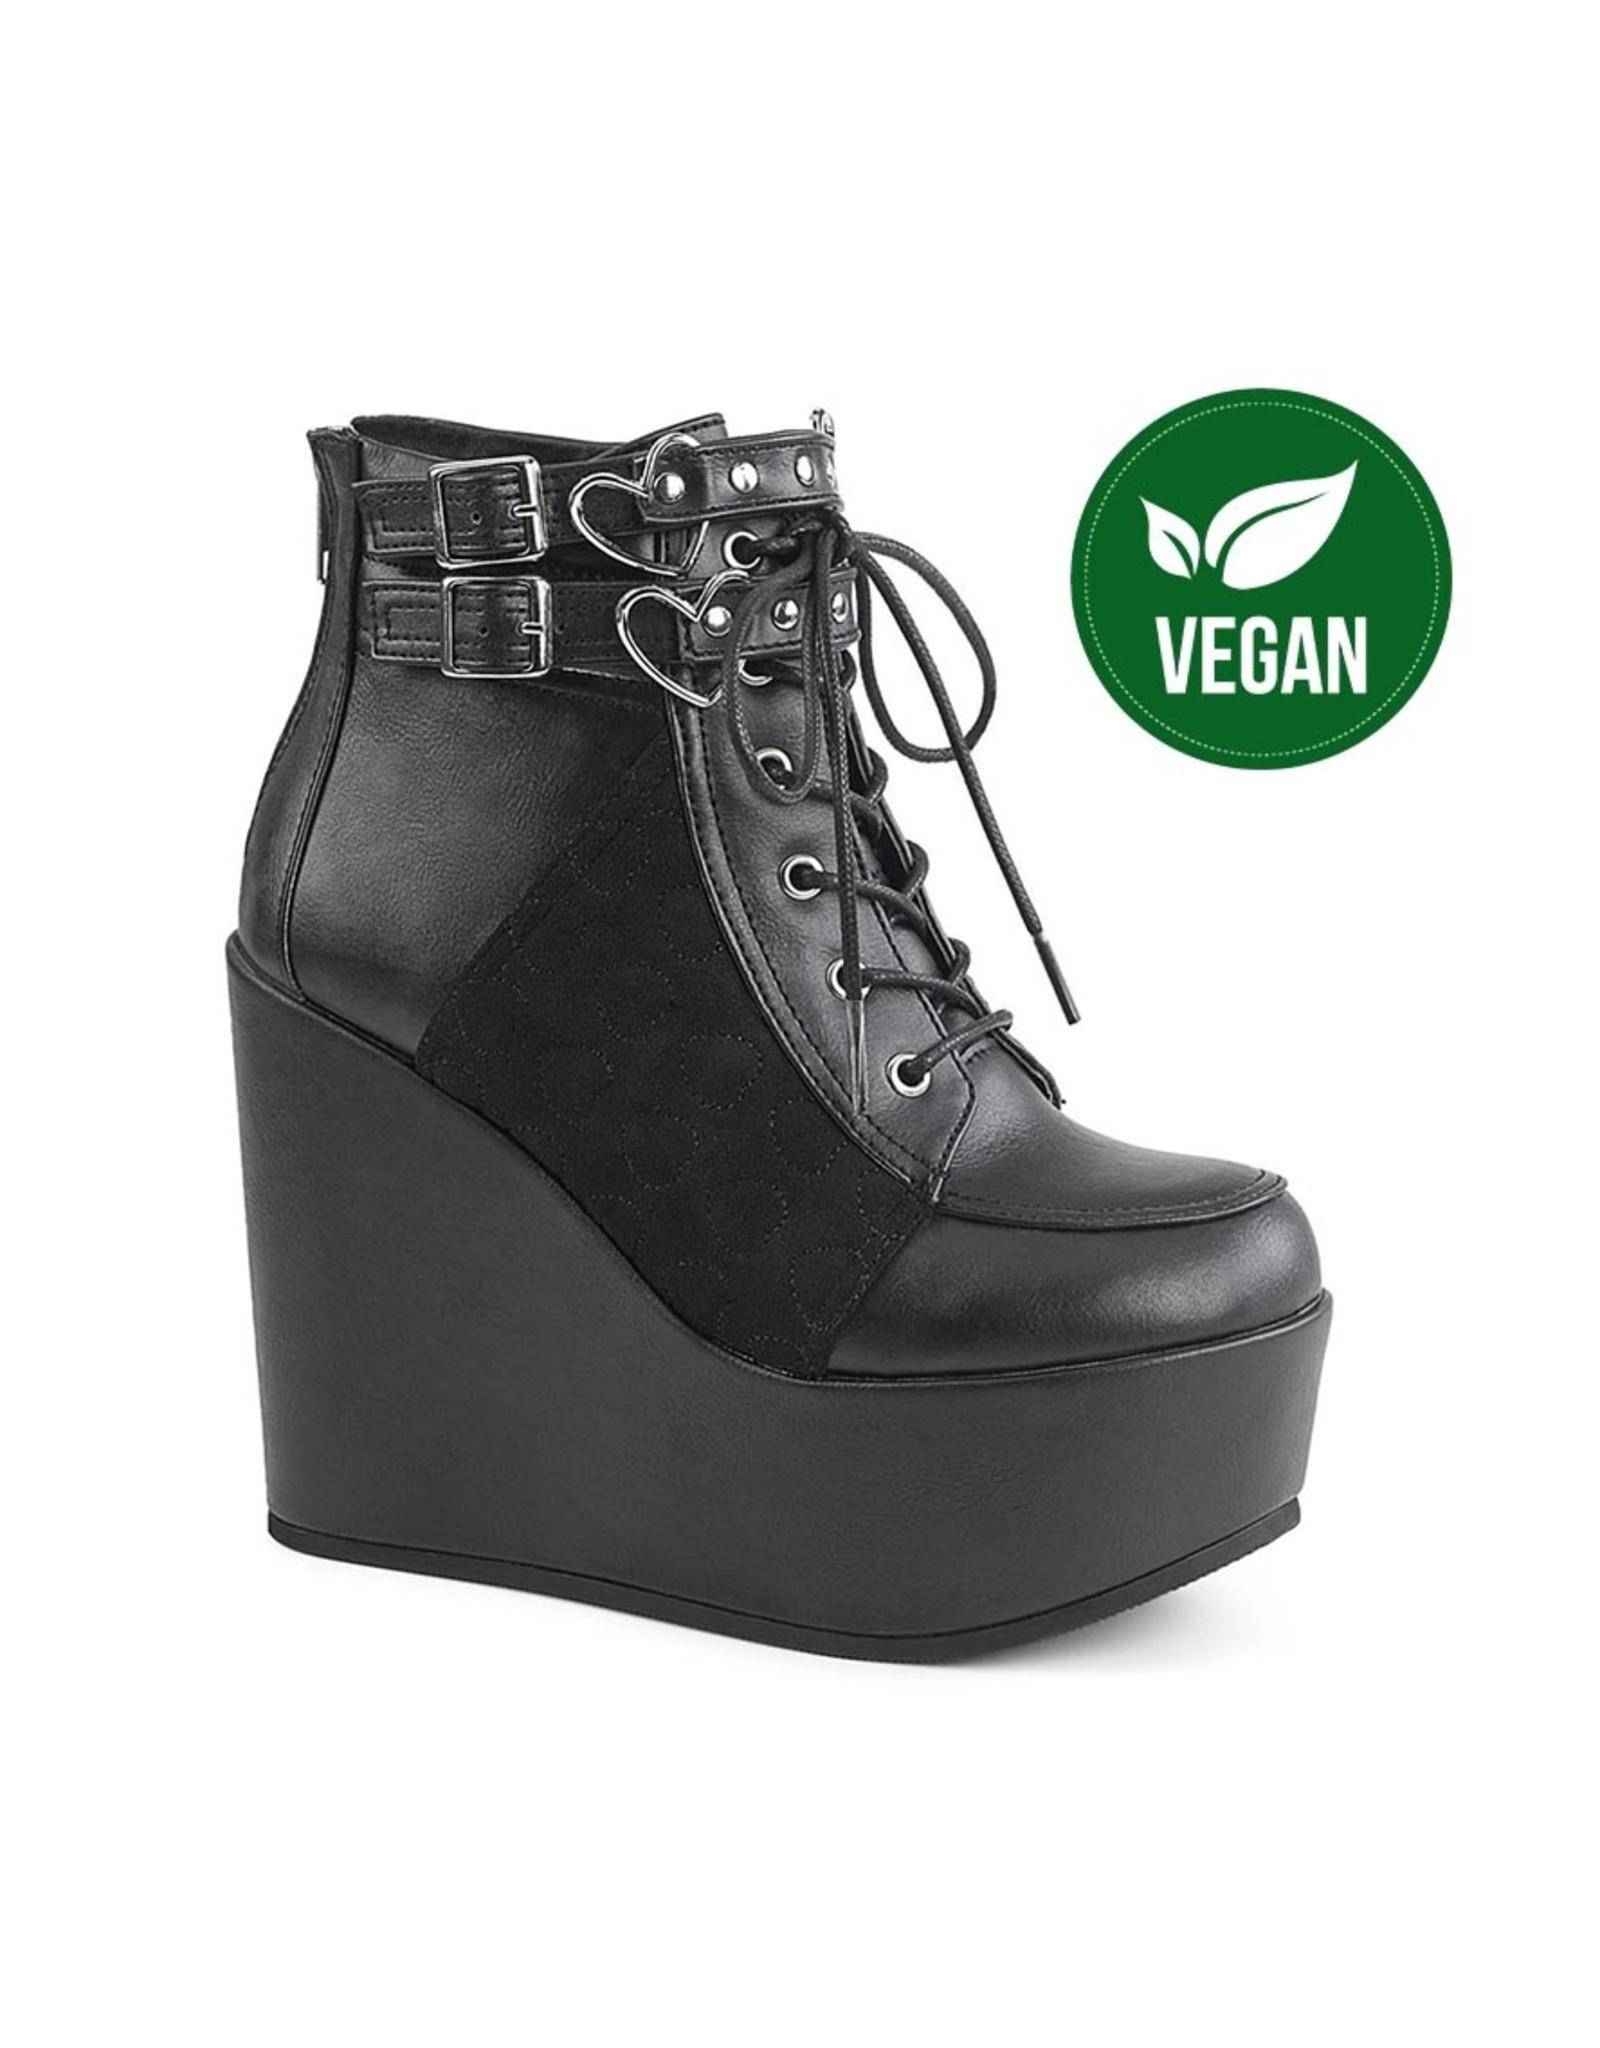 "DEMONIA POISON-105 5"" Wedge Platform Black Vegan Leather-Velvet Boot w/ Double Buckled Ankle Straps, Heart Embroidered Panel + Heart Ring Details, Back Metal Zipper D41VBV"